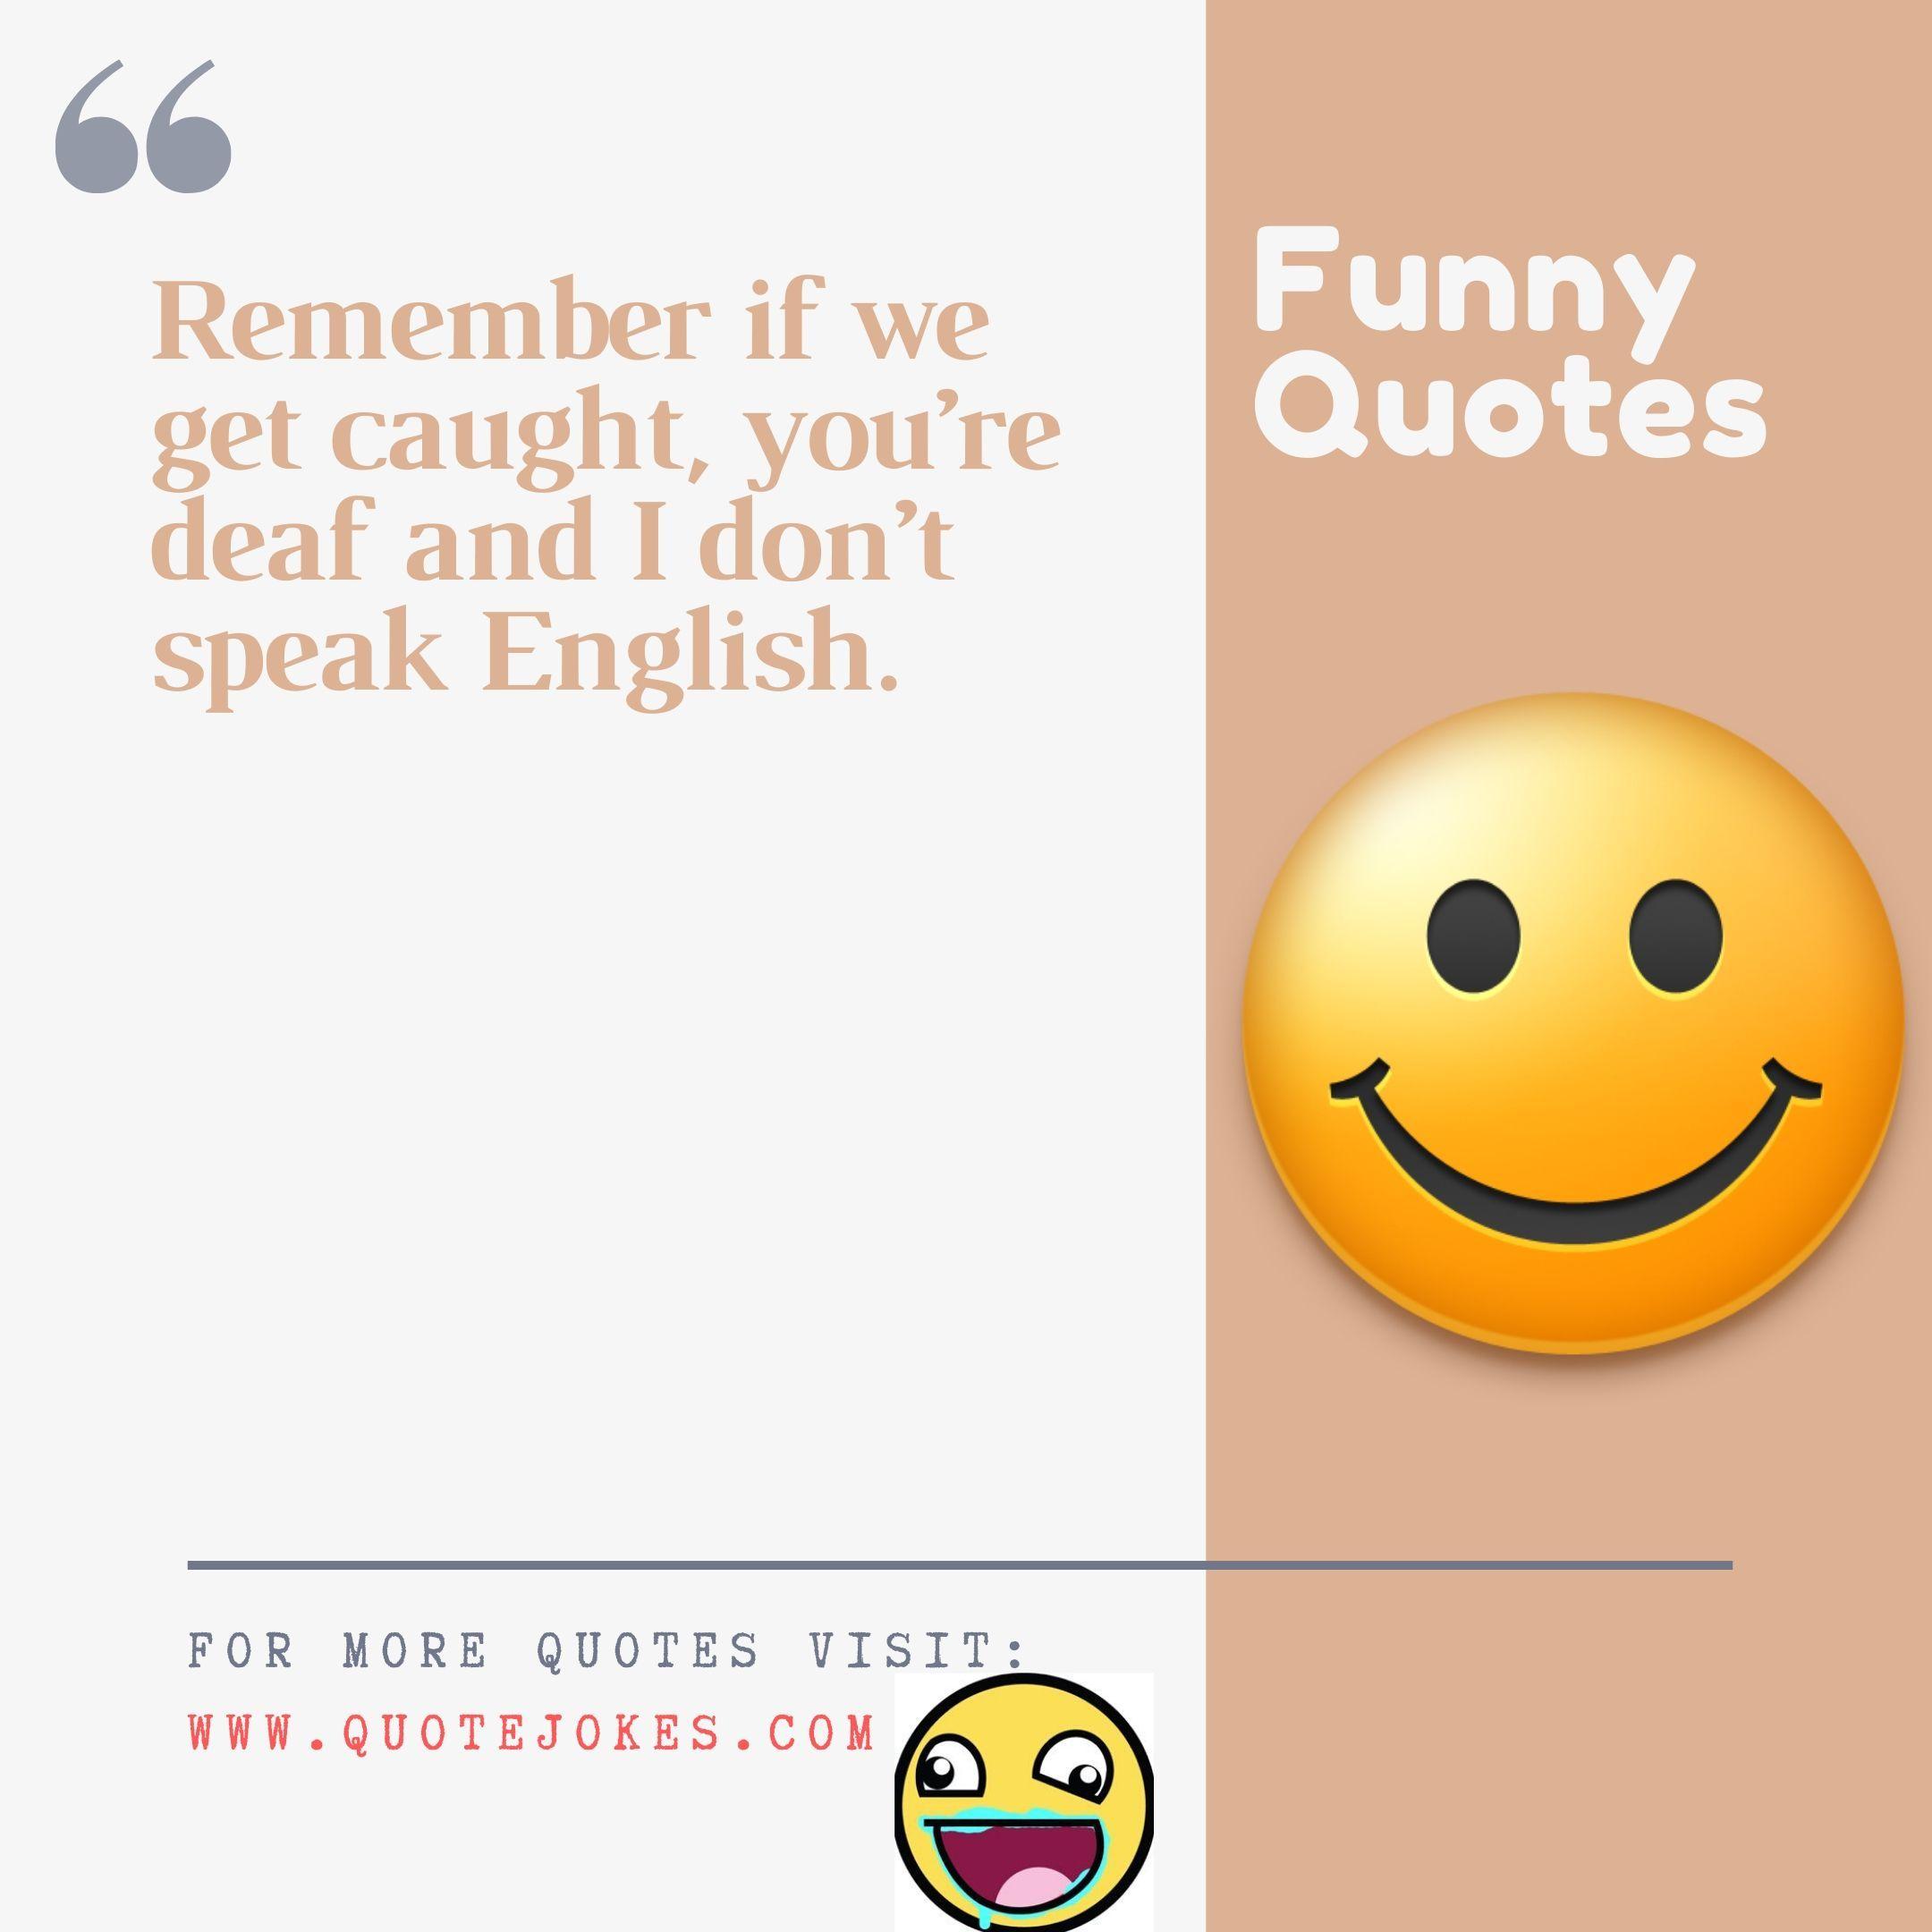 Funny Quotes Me Quotes Funny Fun Quotes Funny Funny Quotes